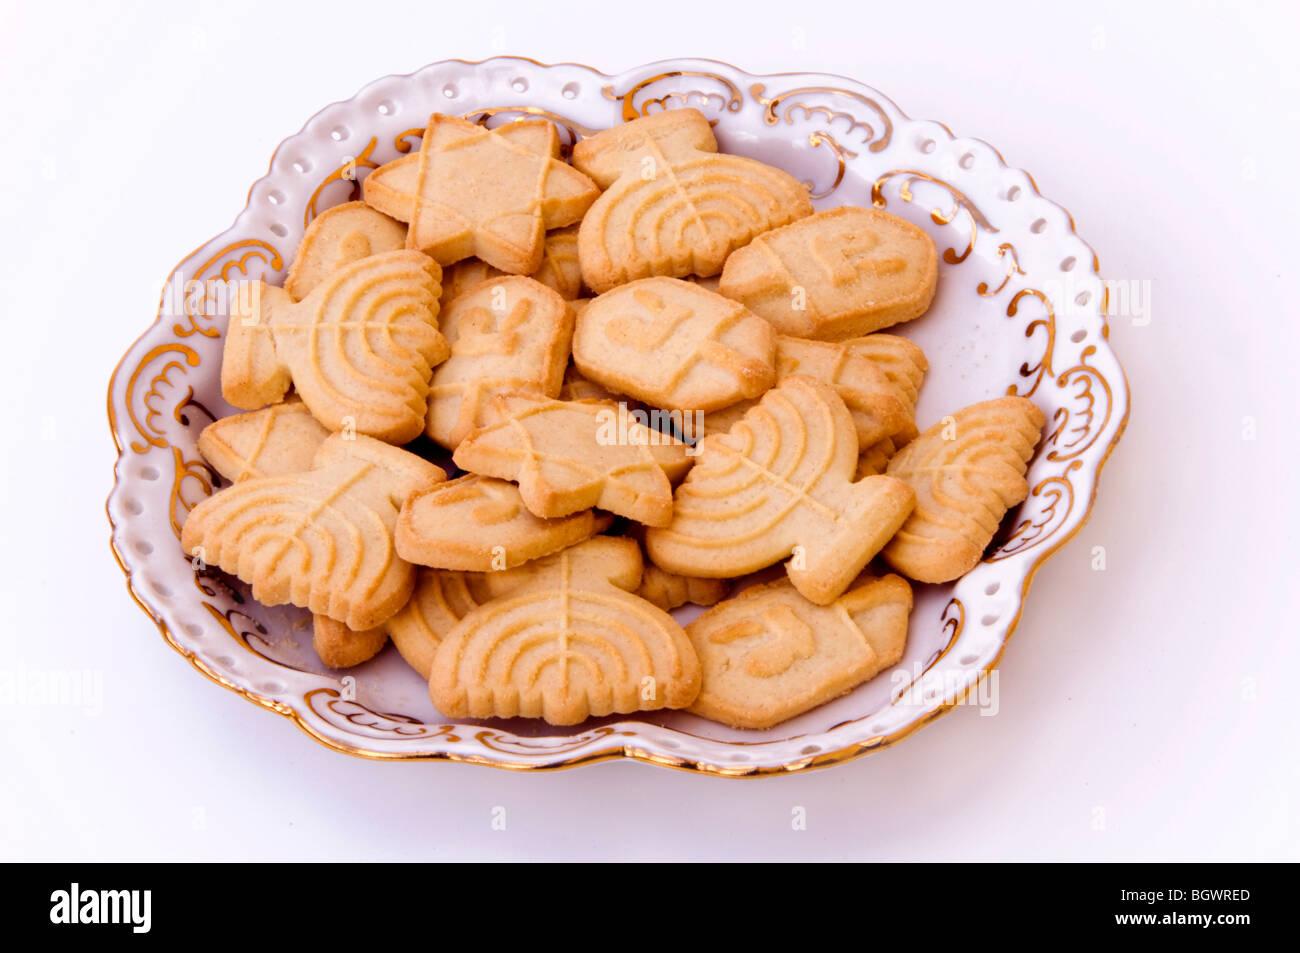 Hanukkah cookies - Stock Image